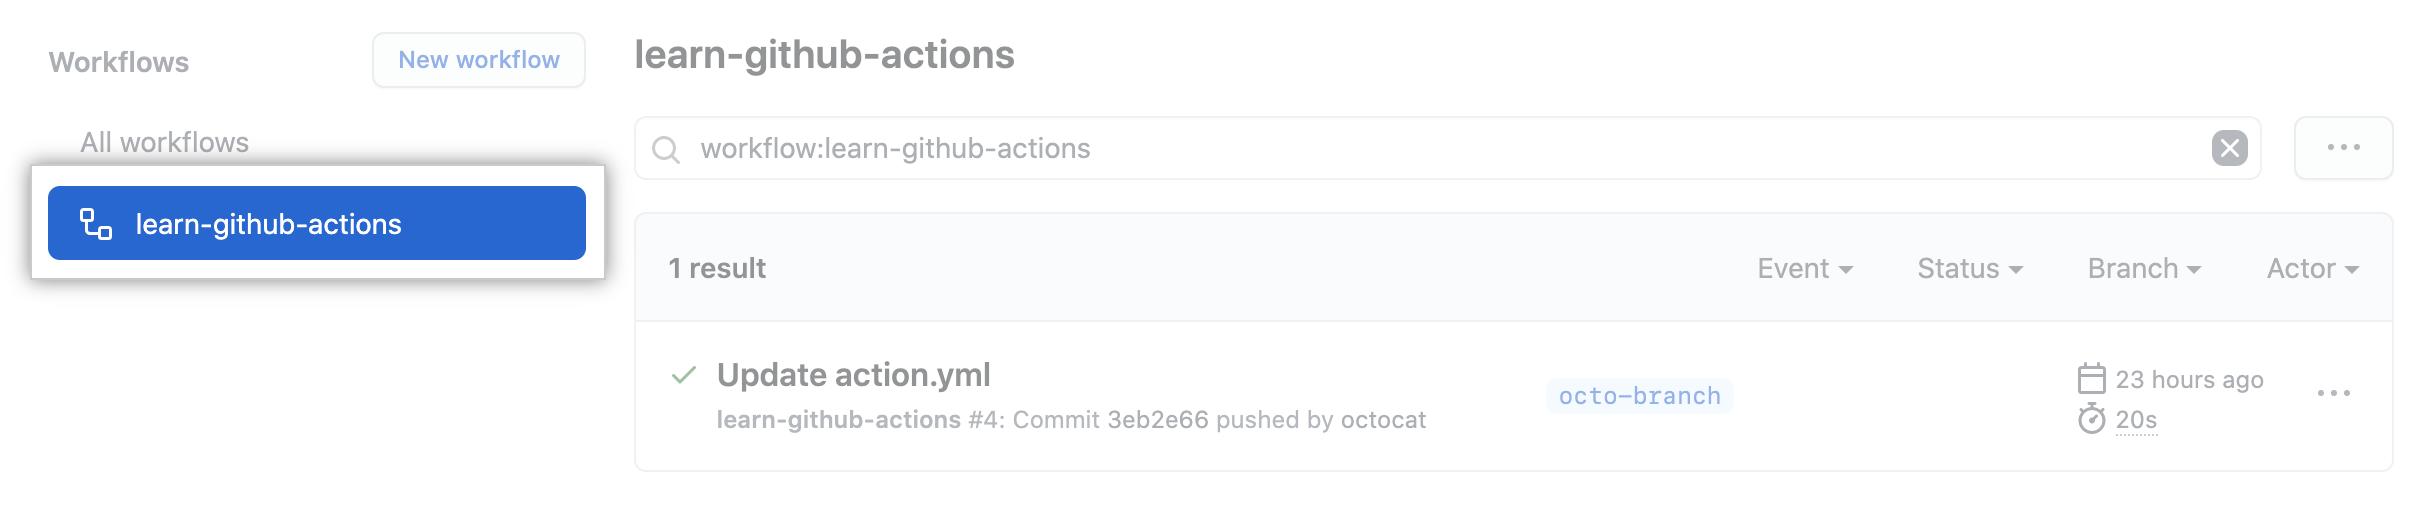 Screenshot of workflow results